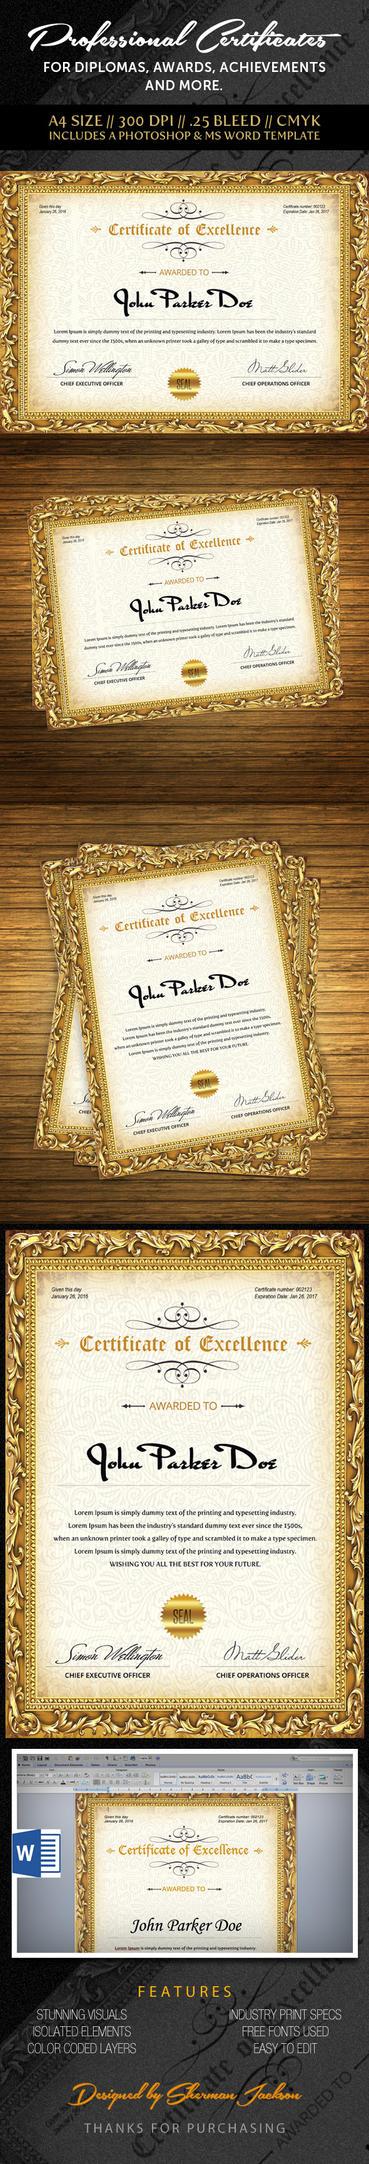 Certificates explore certificates on deviantart finethinks 0 0 multipurpose professional certificates diplomas by shermandavidjackson yadclub Choice Image